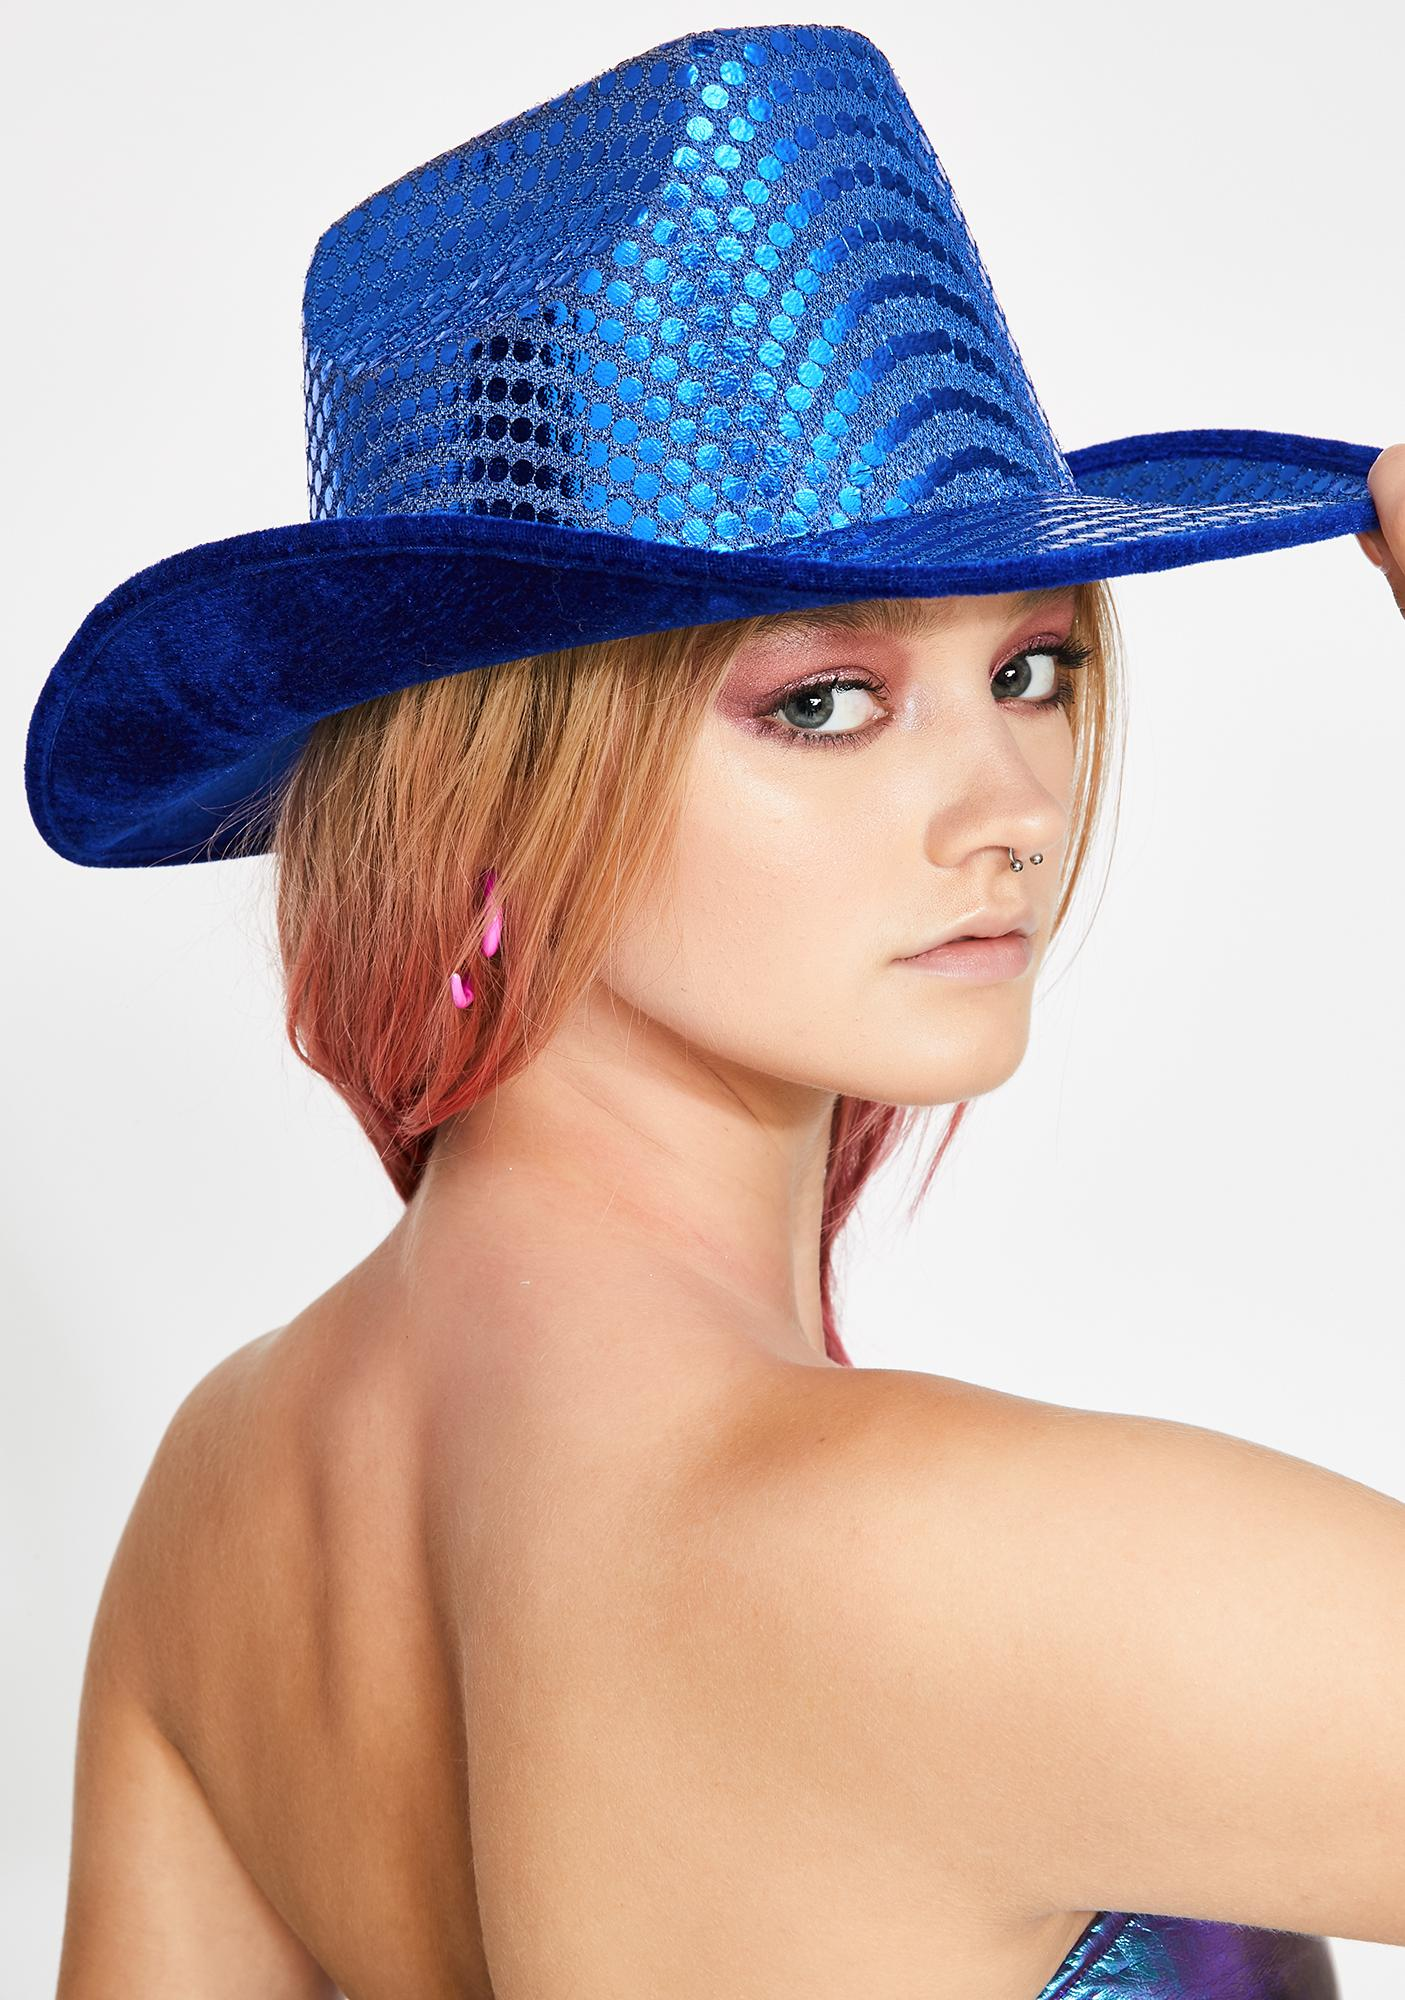 Replay Vintage Sunglasses Blue Space Cowboy Hat